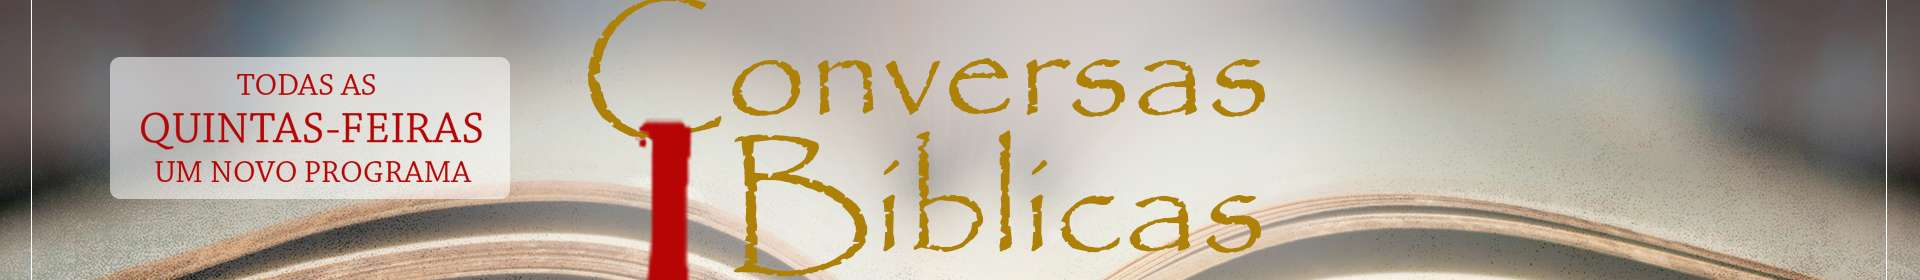 Conversas Bíblicas: Doutrina de corpo - Parte 3